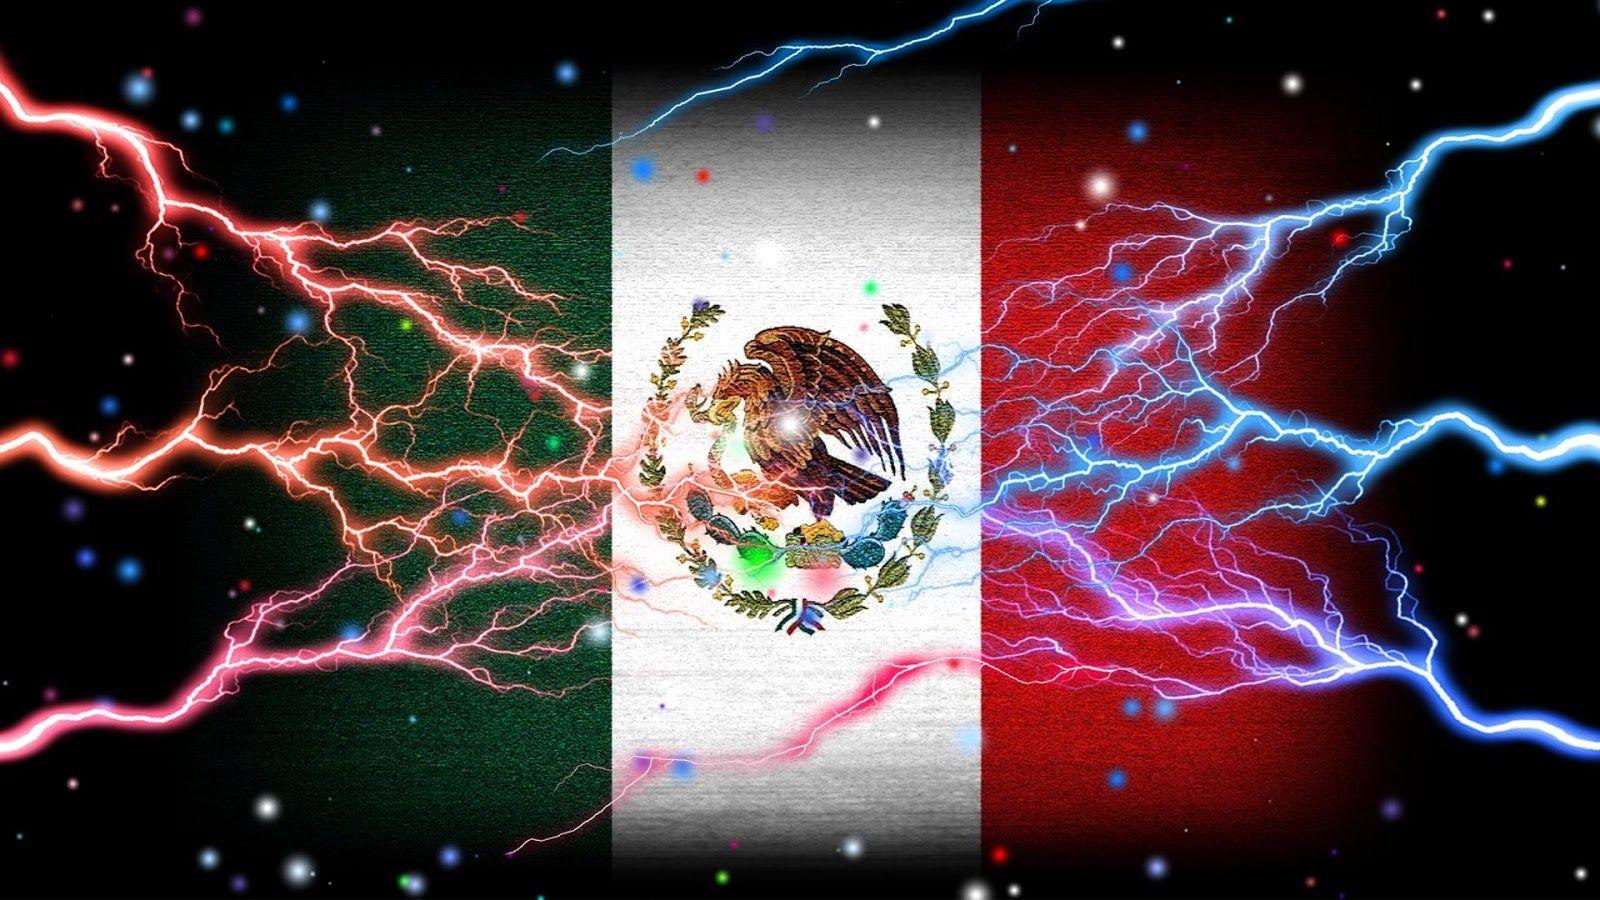 Pin by Bradleythomasloefler on comicks Pinterest Mexico flag 1600x900